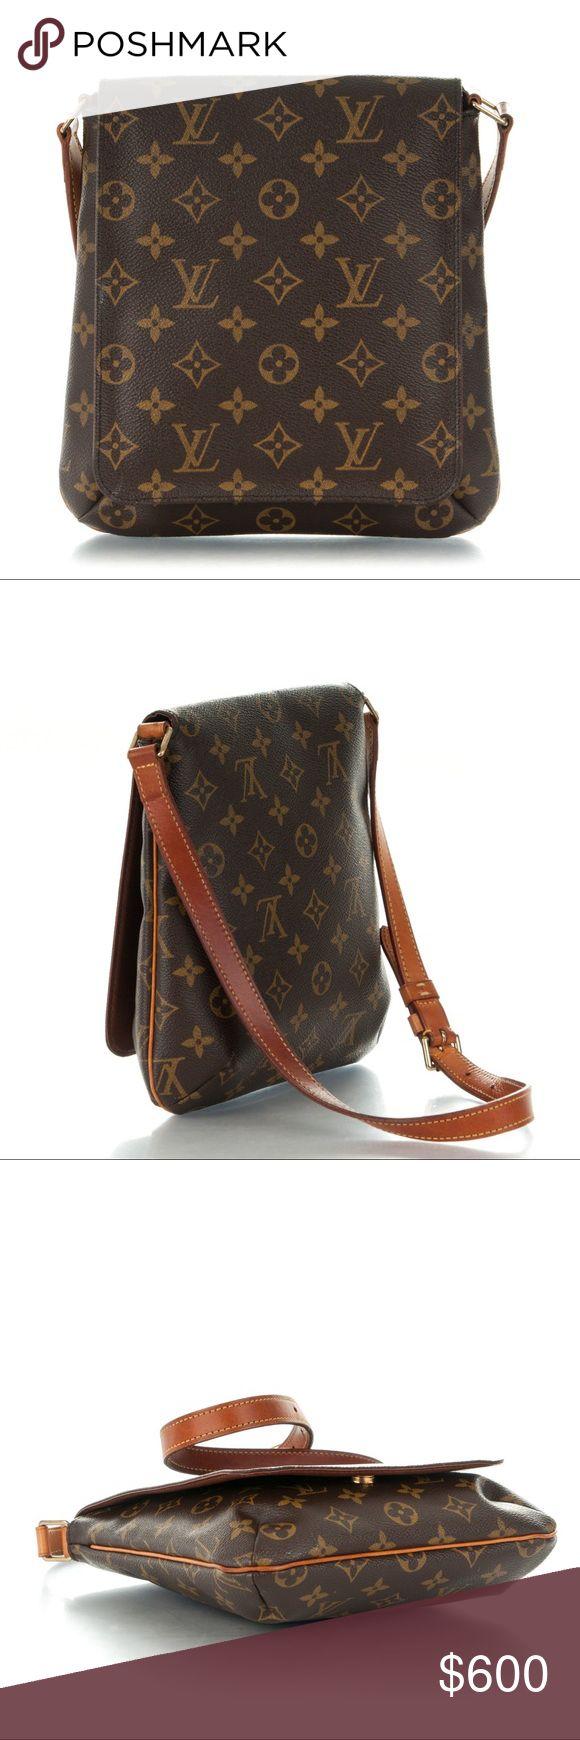 ❗️NWB❗️Louis Vuitton Monogram Musette Salsa bag Brand New with box! Louis Vuitton Monogram Musette Salsa Messenger Bag! Louis Vuitton Bags